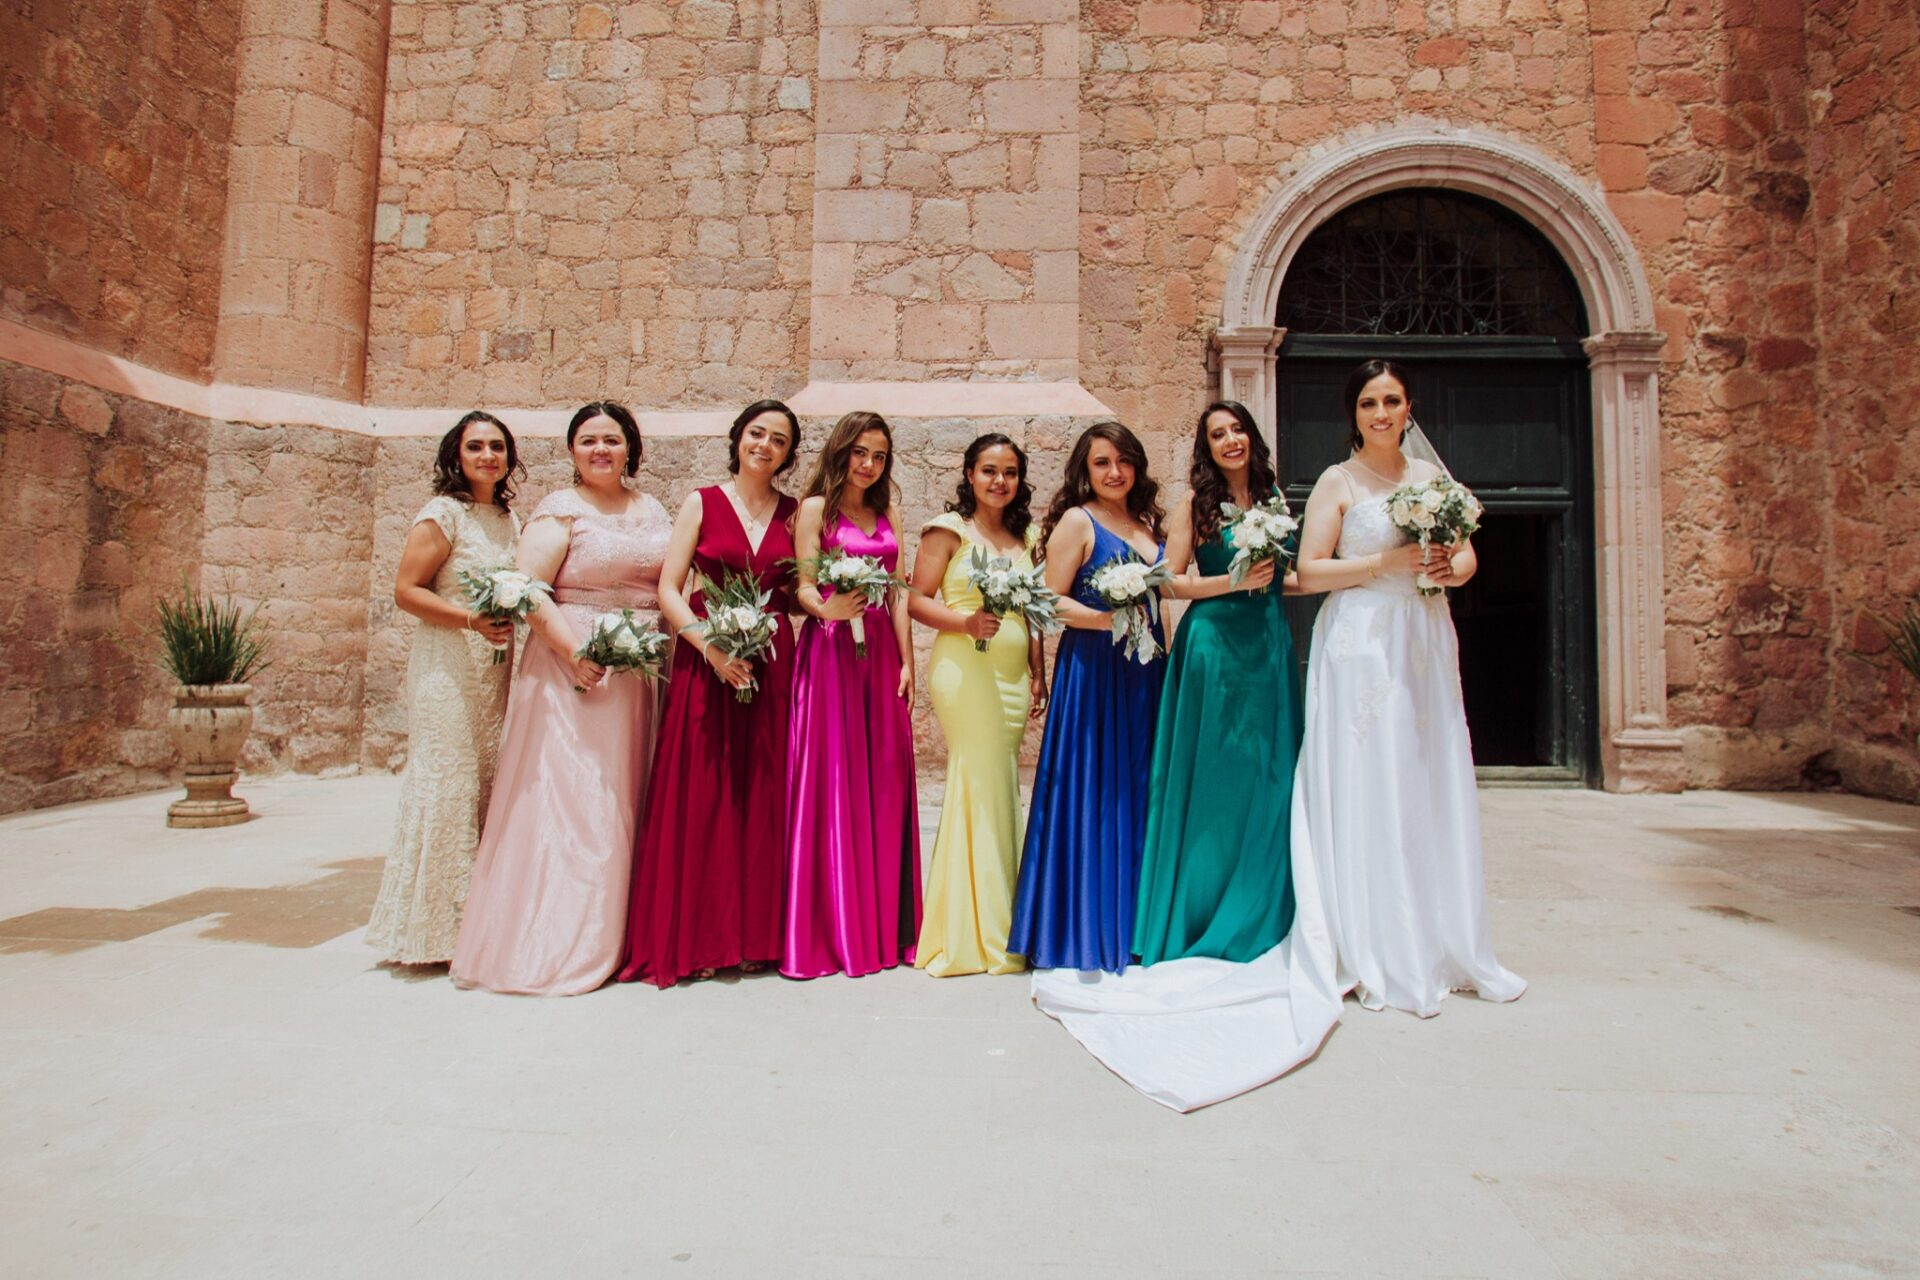 javier_noriega_fotografo_bodas_centro_platero_zacatecas_wedding_photographer19